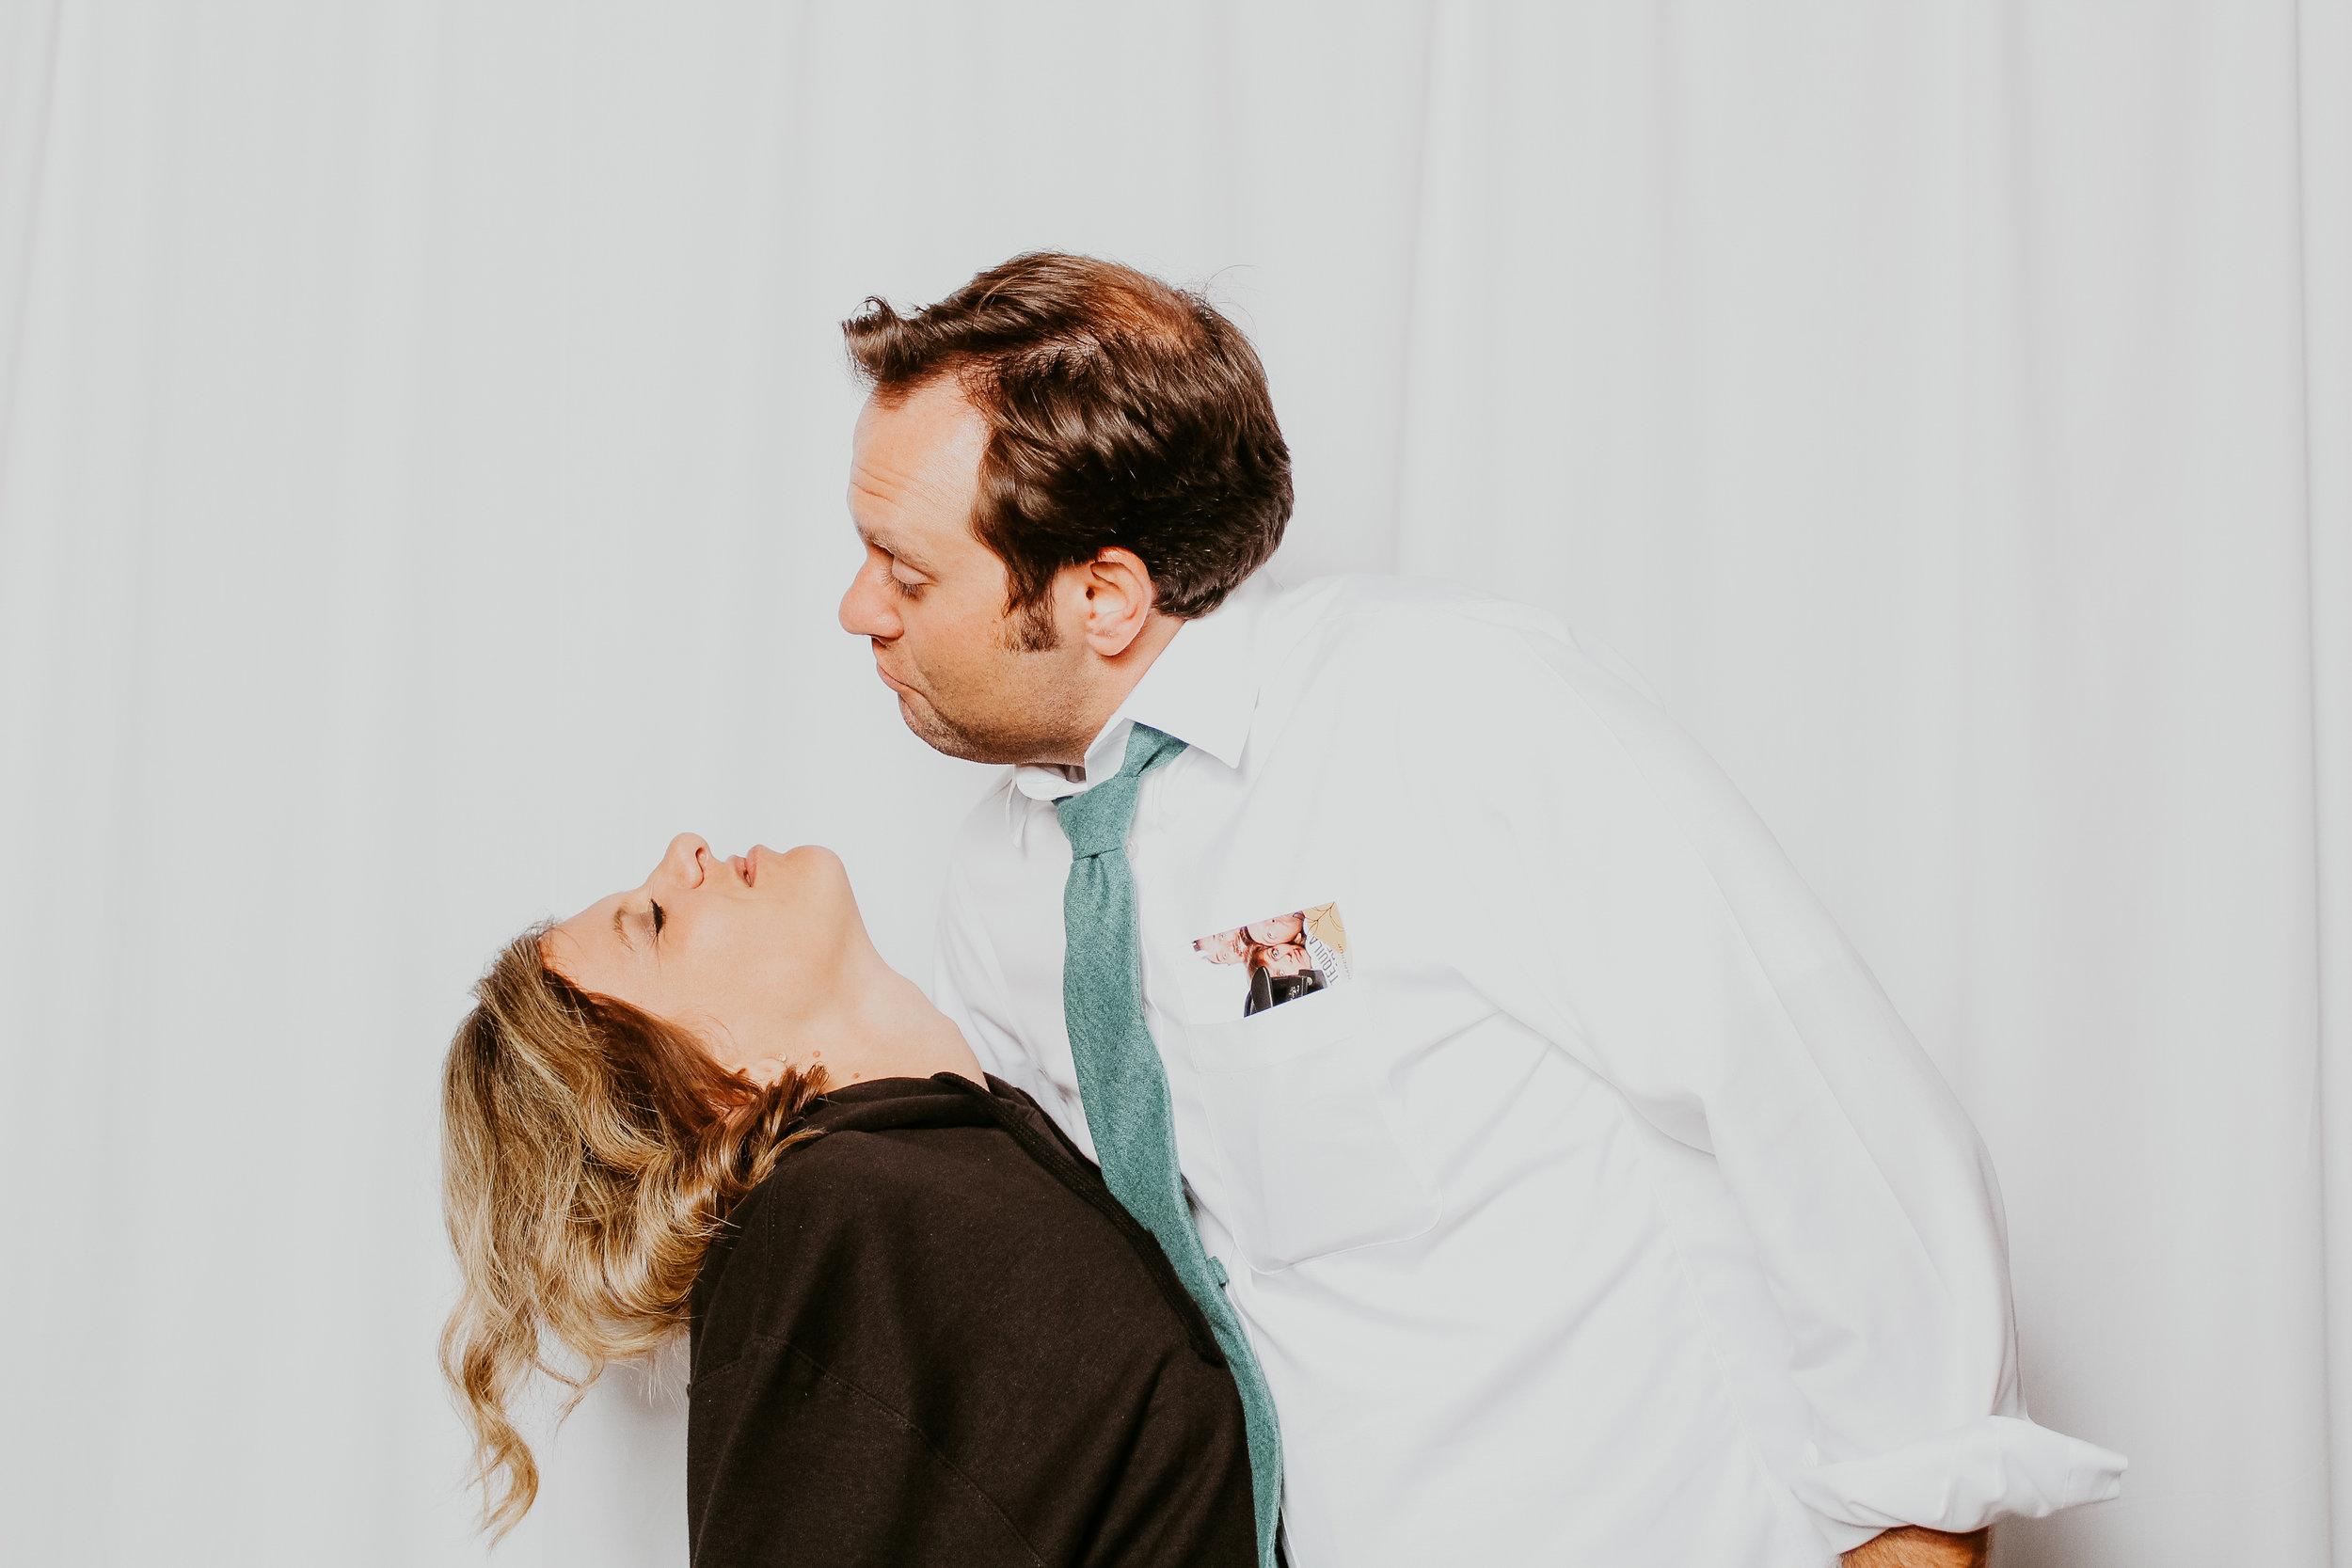 Wedding Photo Booth Rentals